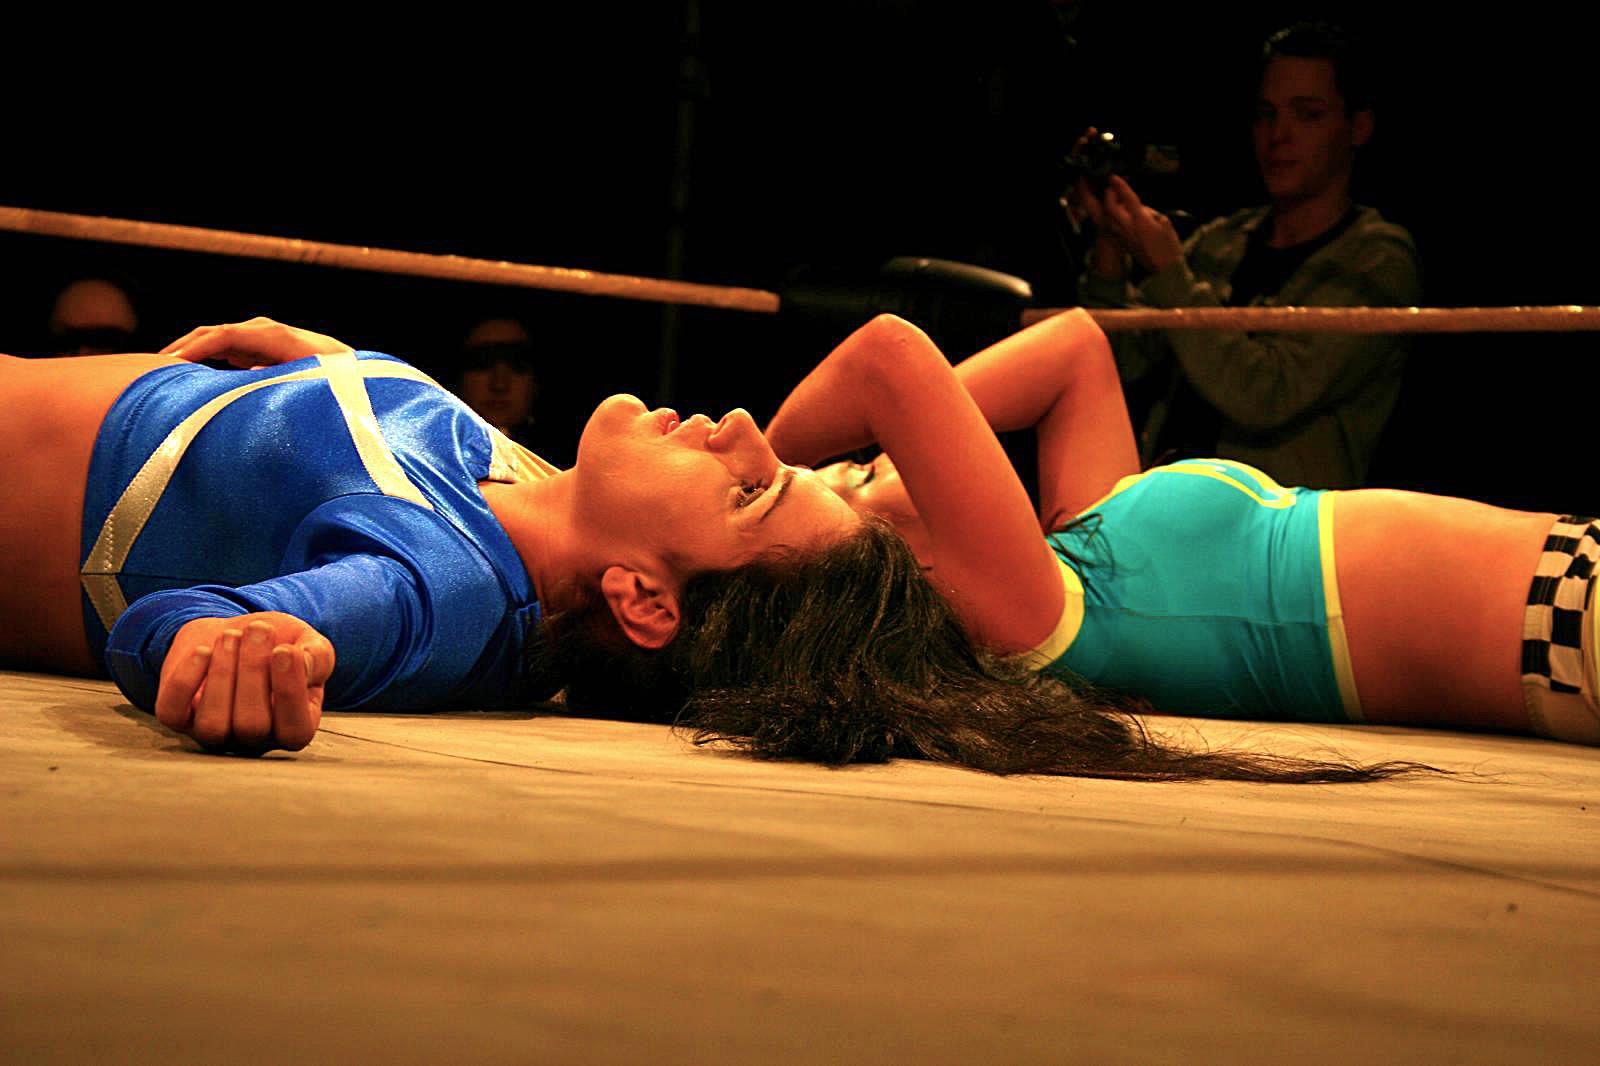 sexy wrestling geile knaben